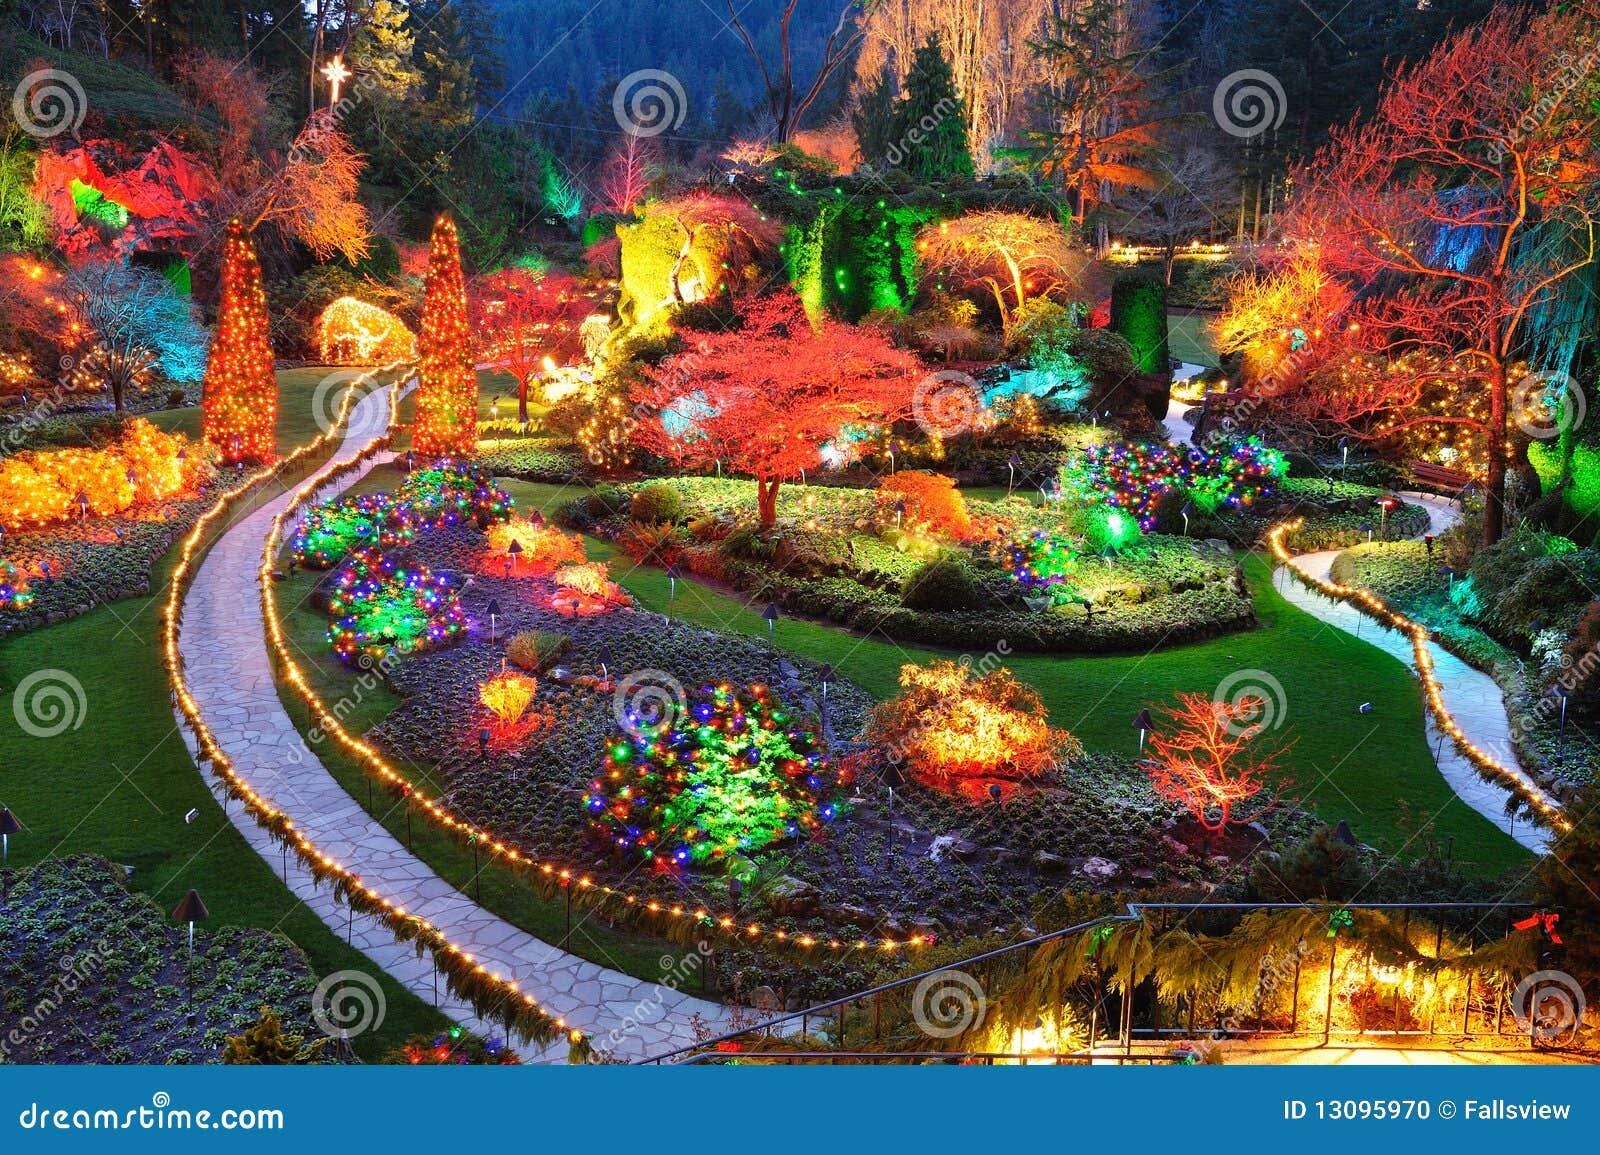 butchart gardens victoria bc 13095970